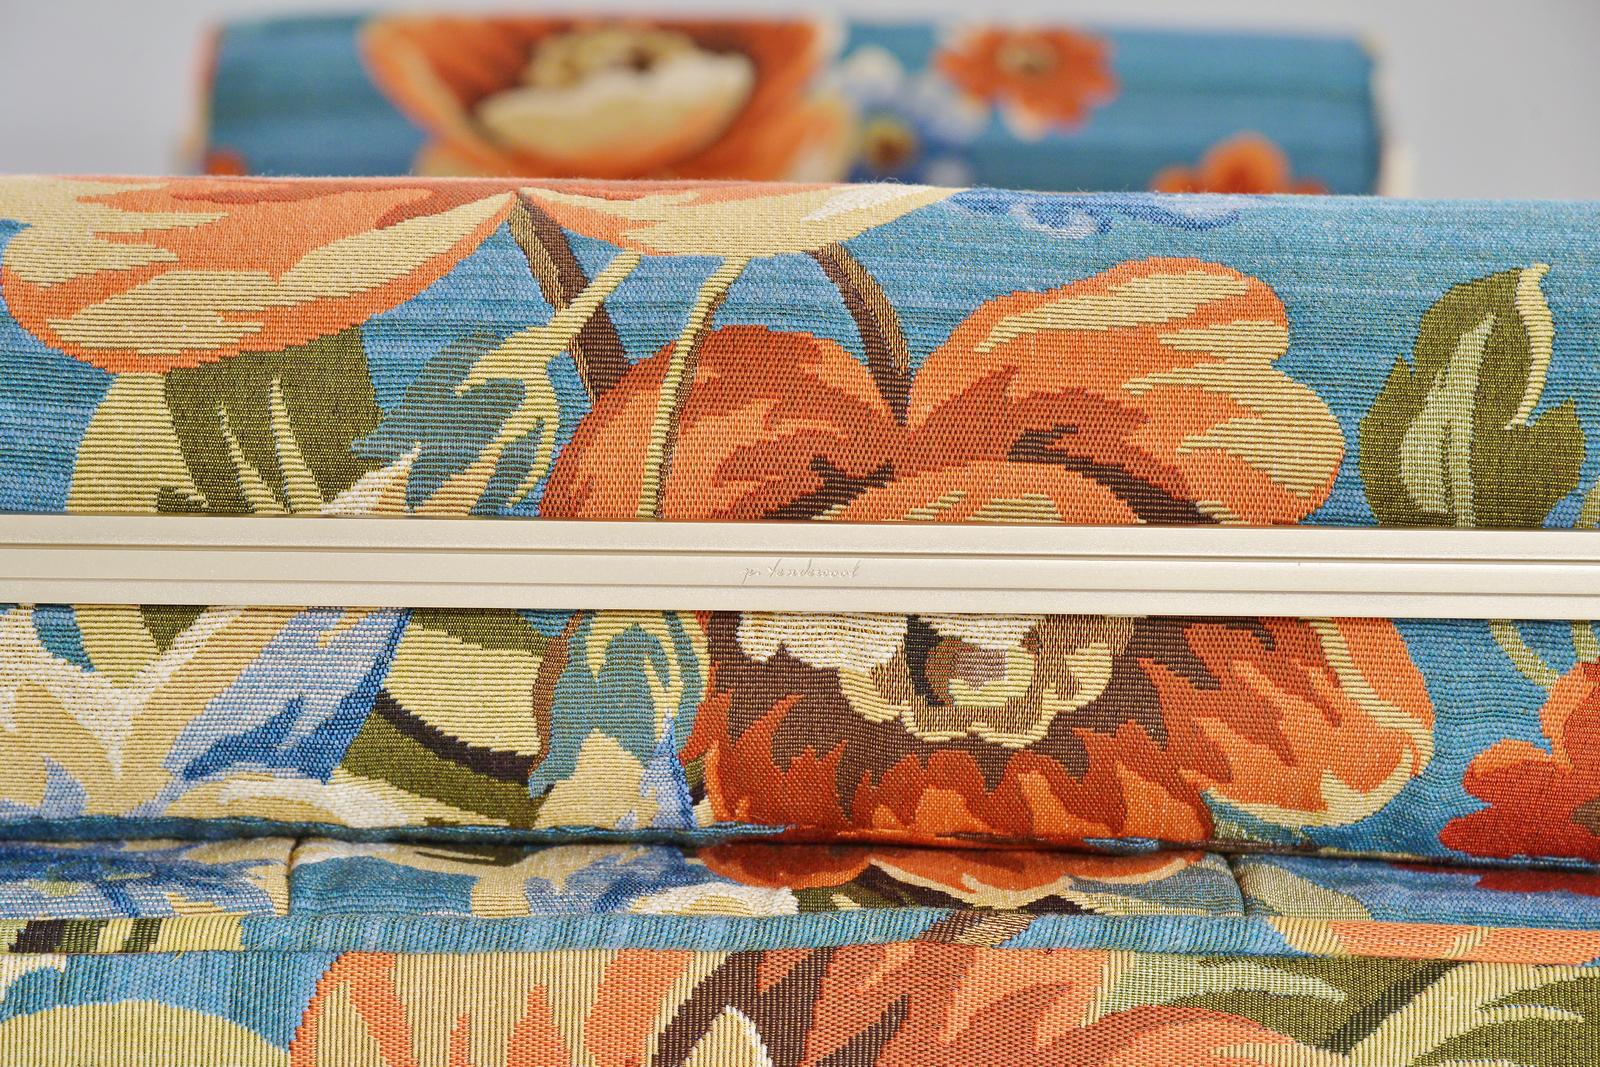 PTendercool-Sofa-PT76-BS1-TE-NO-JD&CO (Garden Tapestry)-190903-05